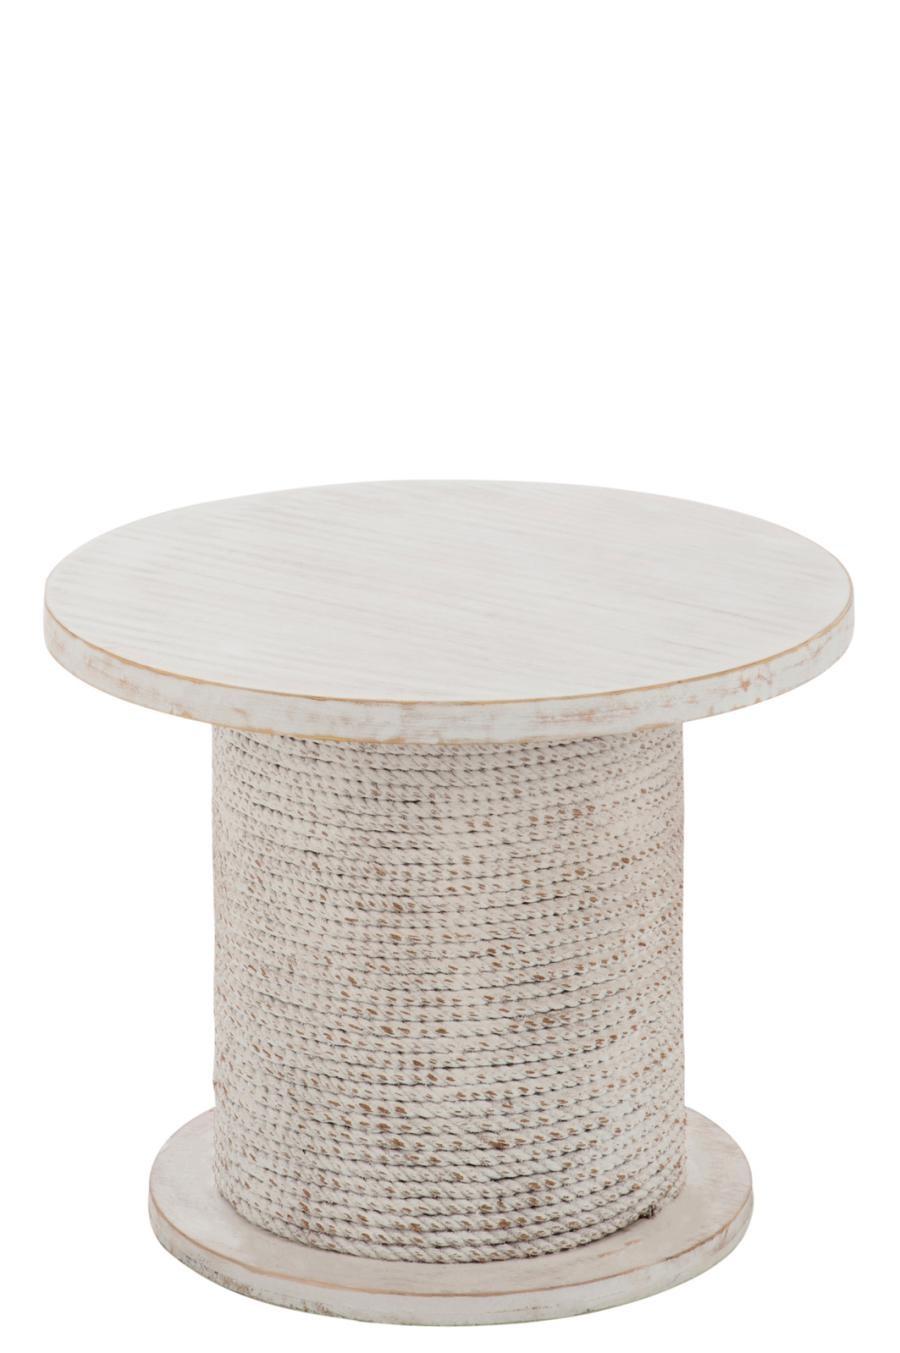 Basse J Line 60x60x49cm Jolipa Table By Bois BlancCorde Bobine cS3Aq5jL4R